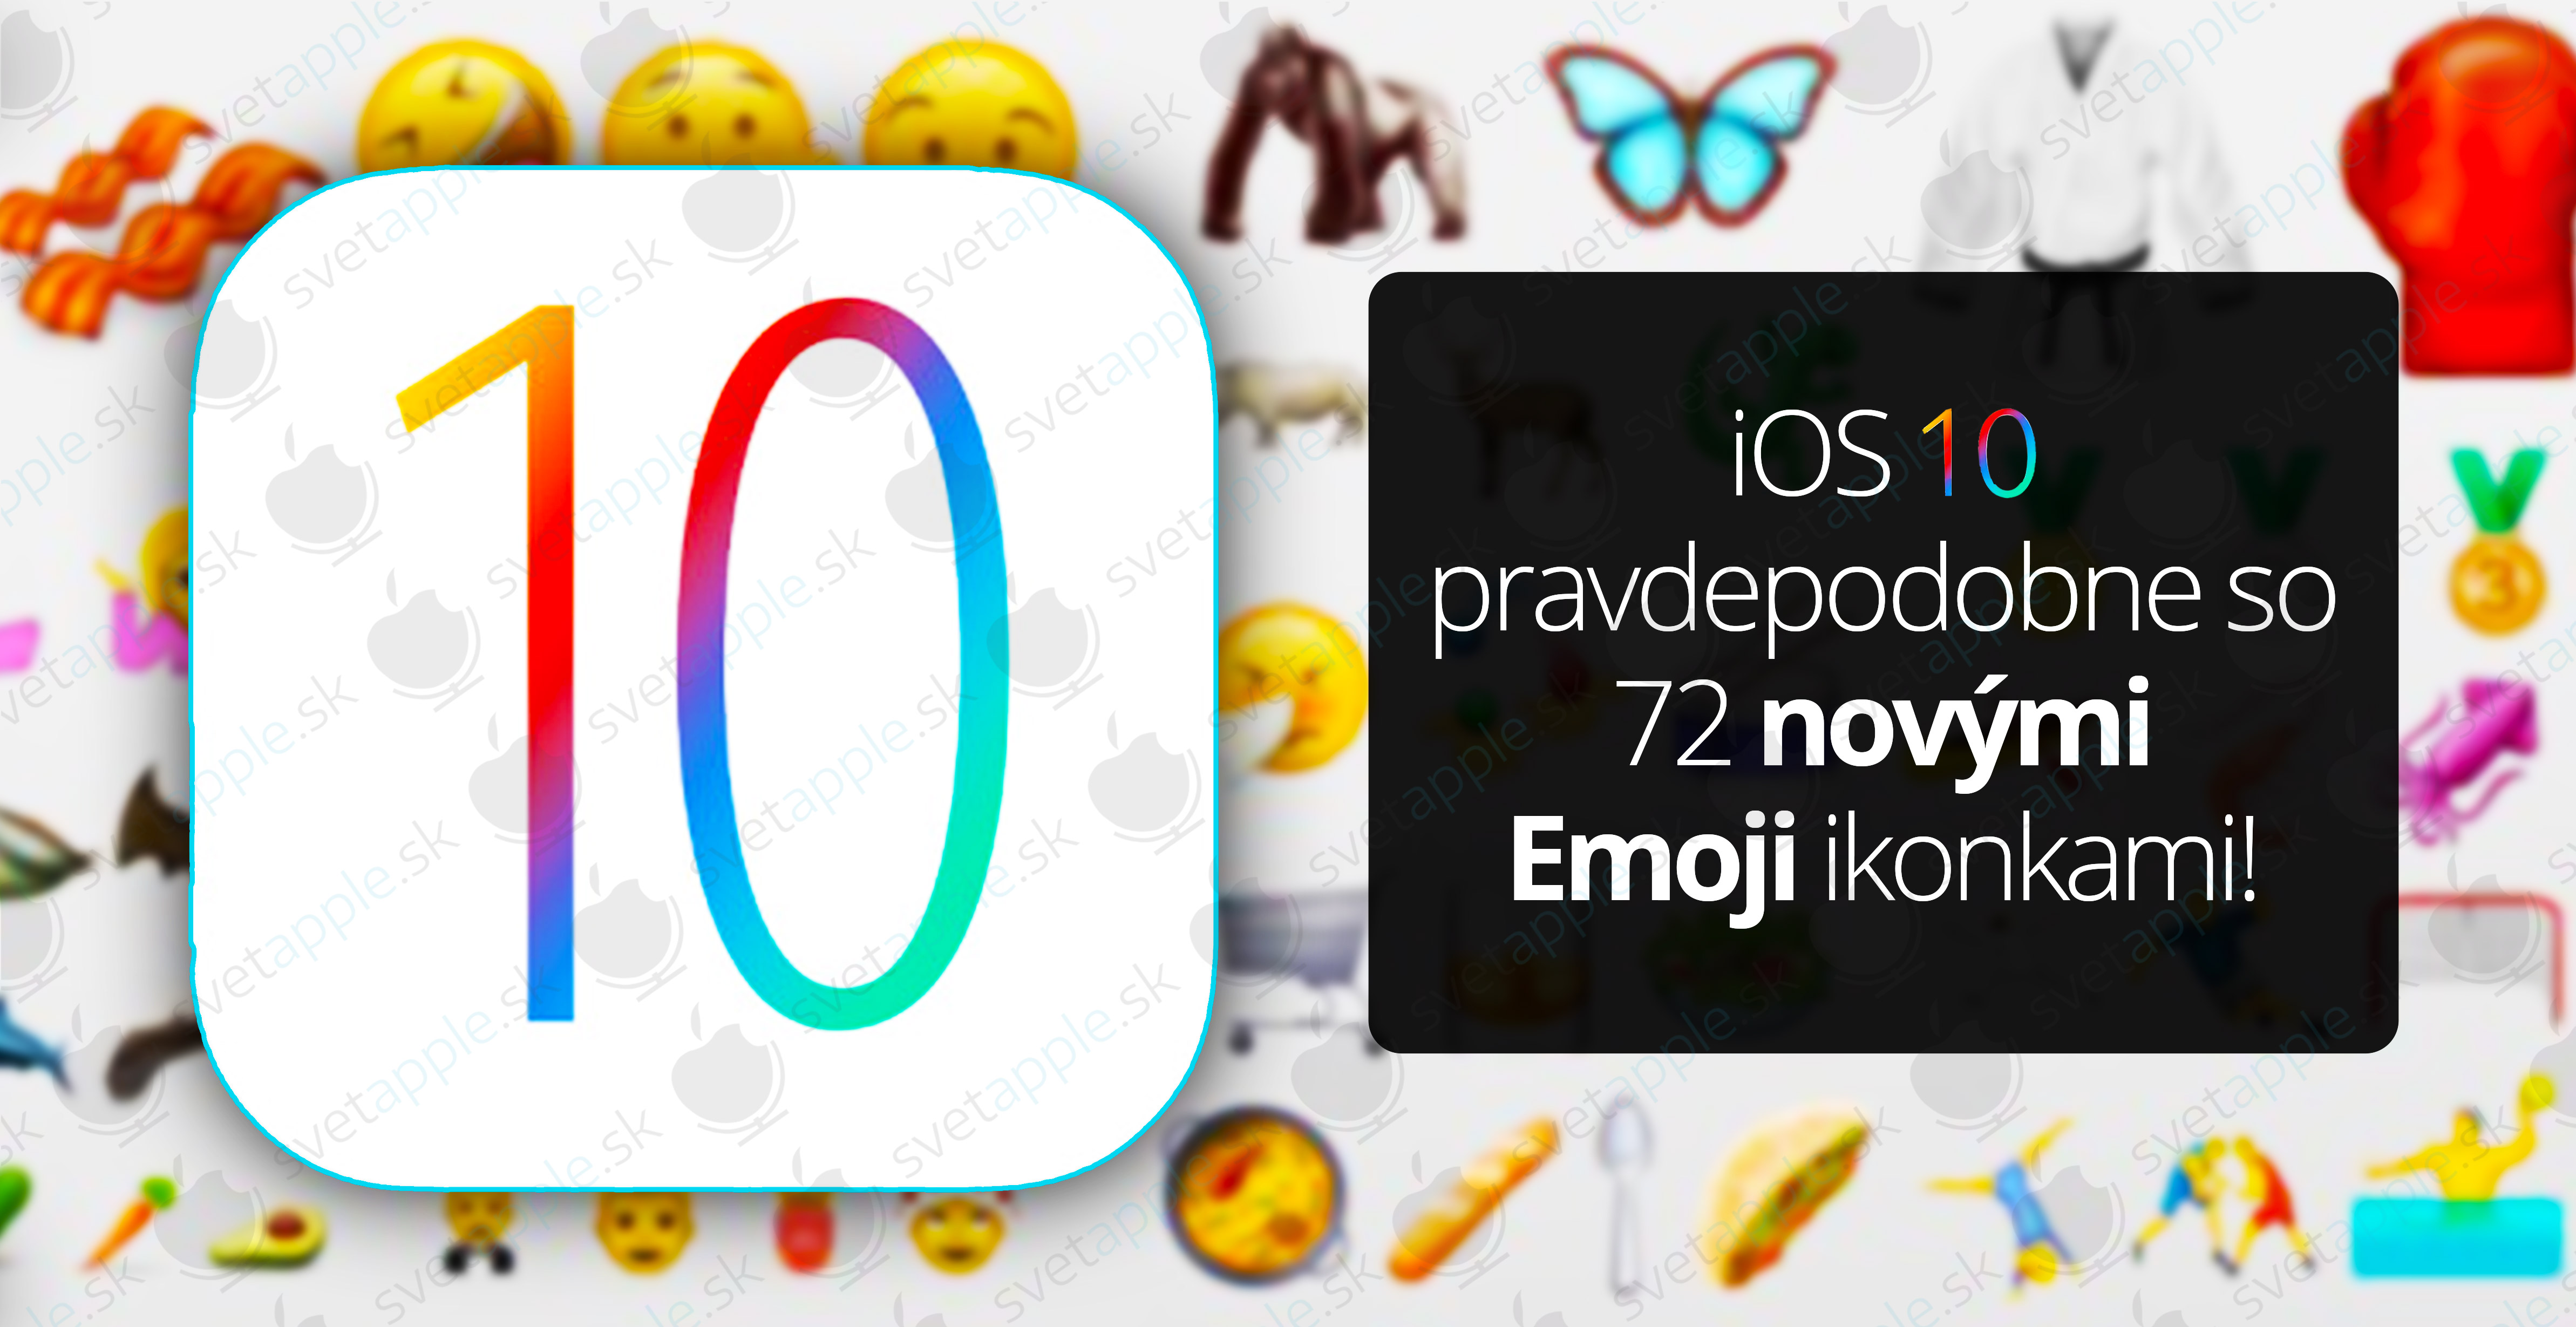 iOS-10-Emoji-svetapple